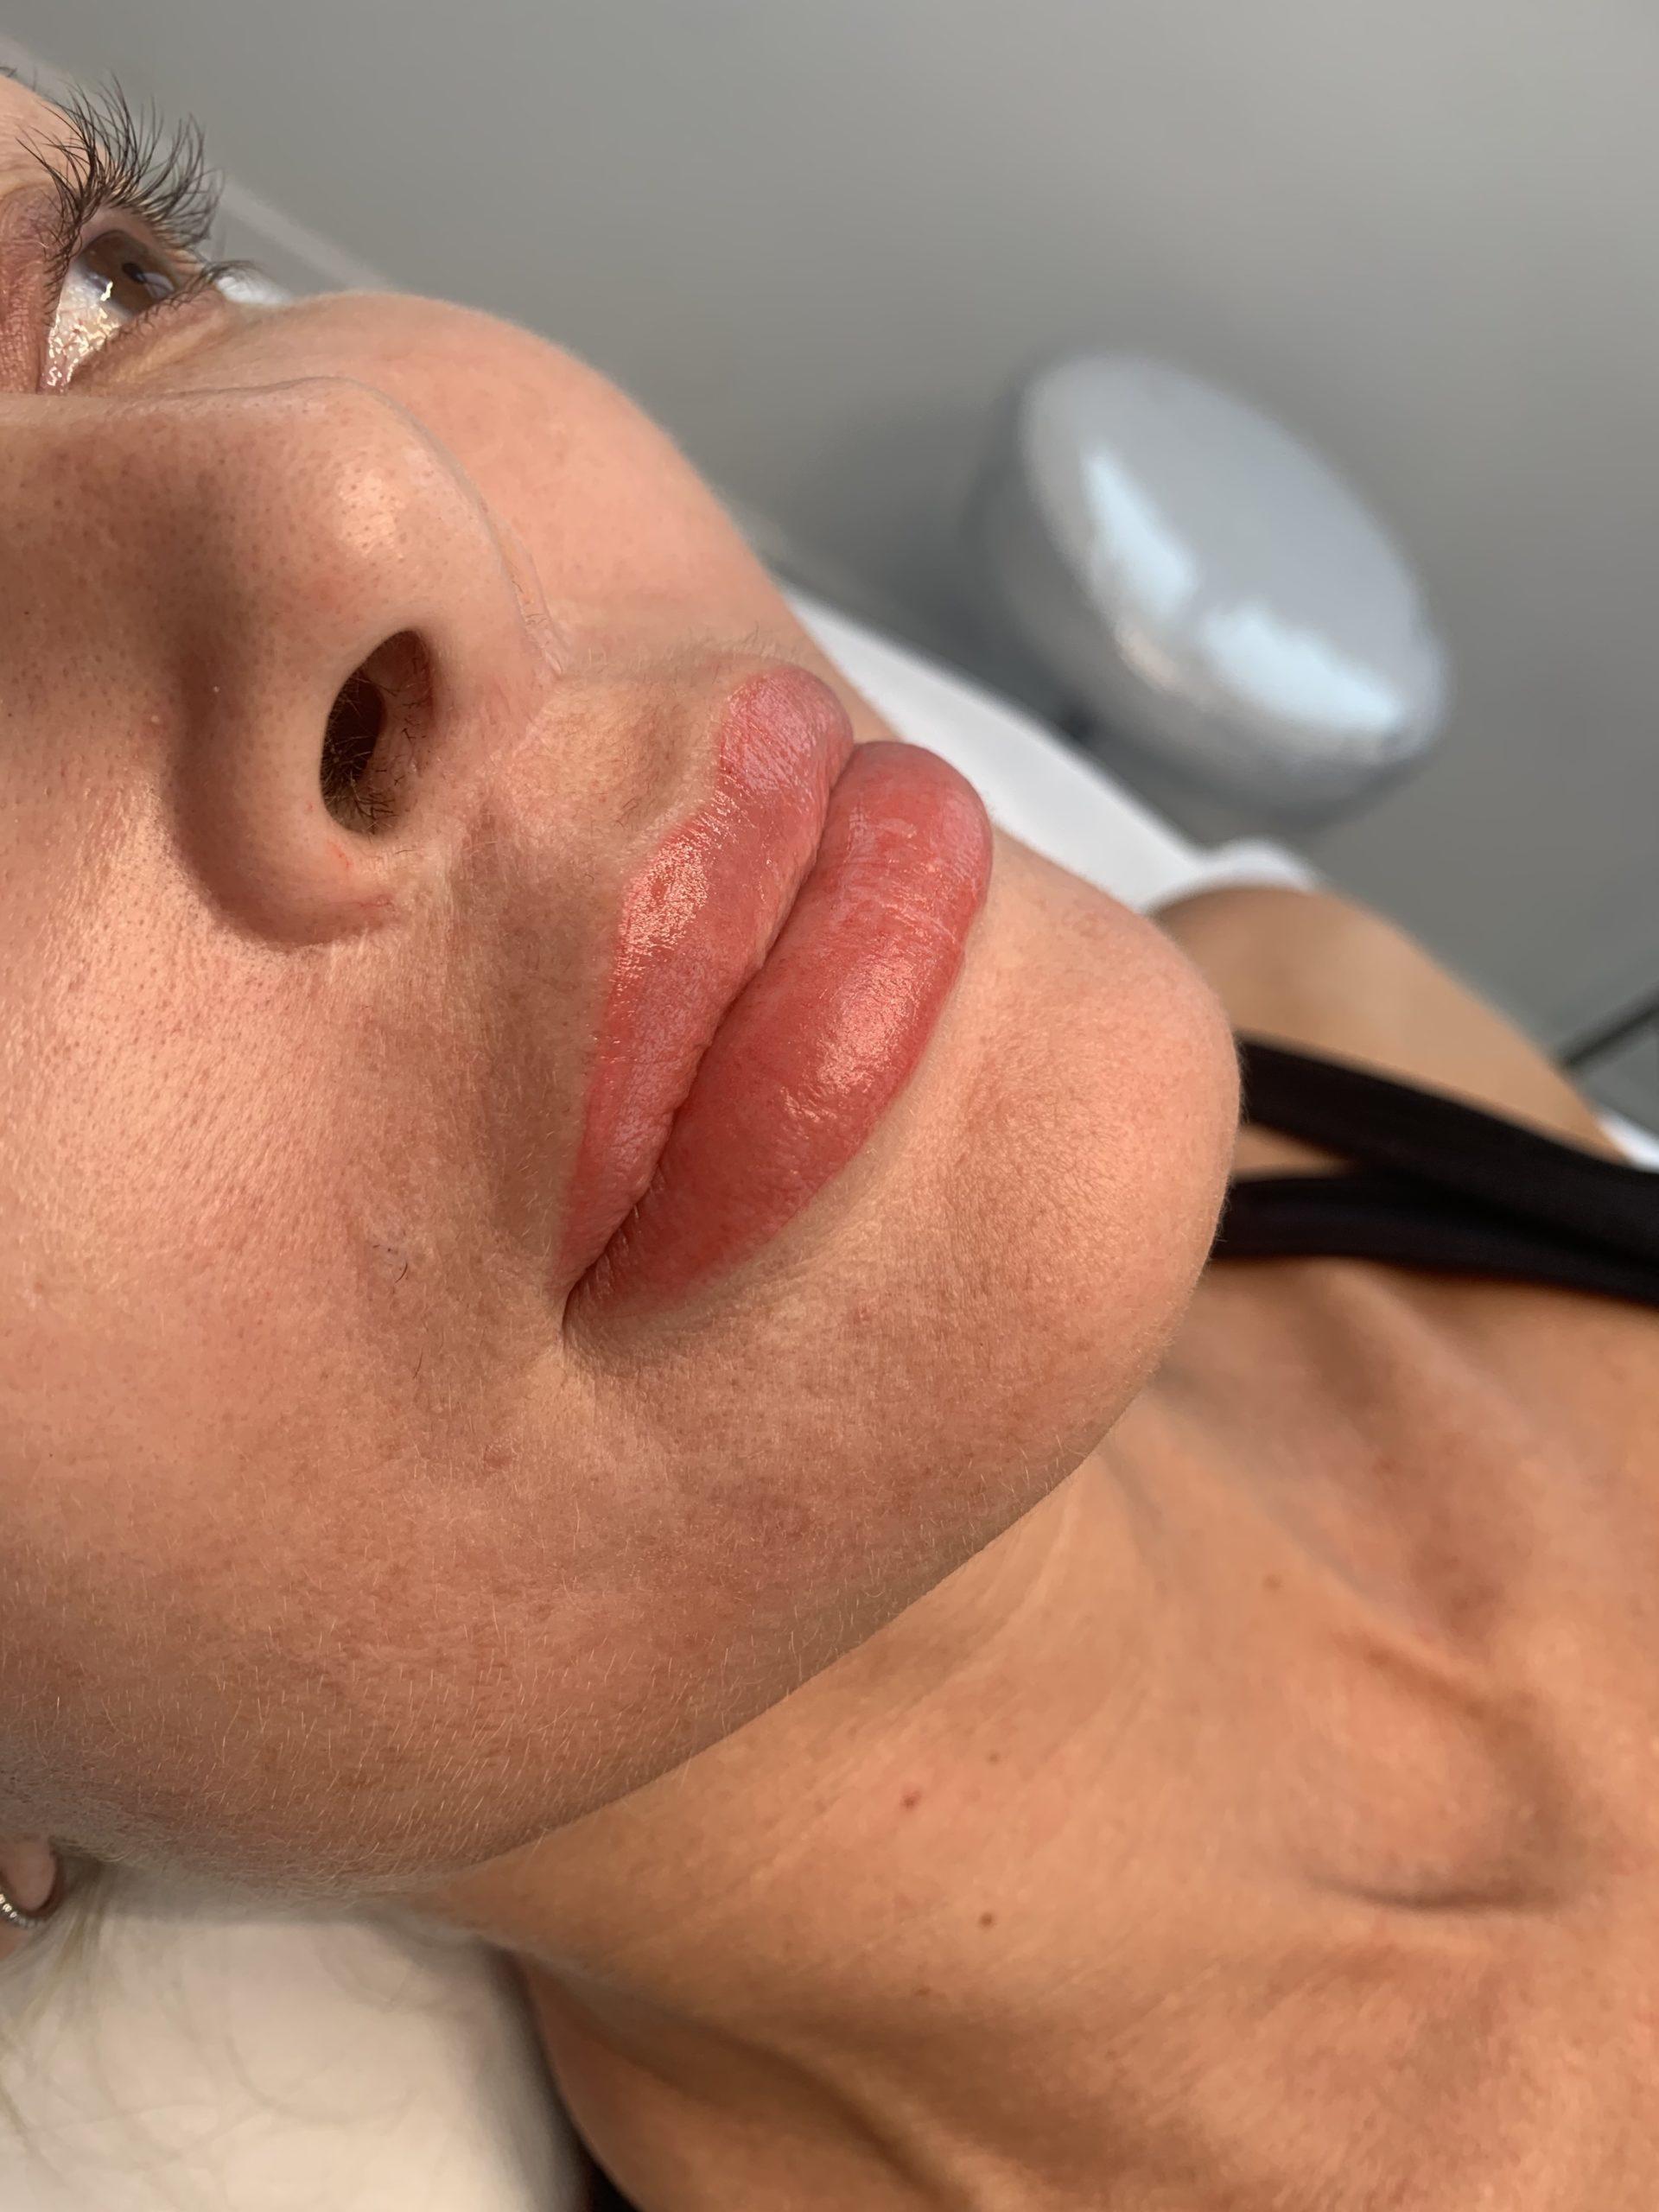 Microblading's Latest Instagram-Worthy Look: Lip Porn